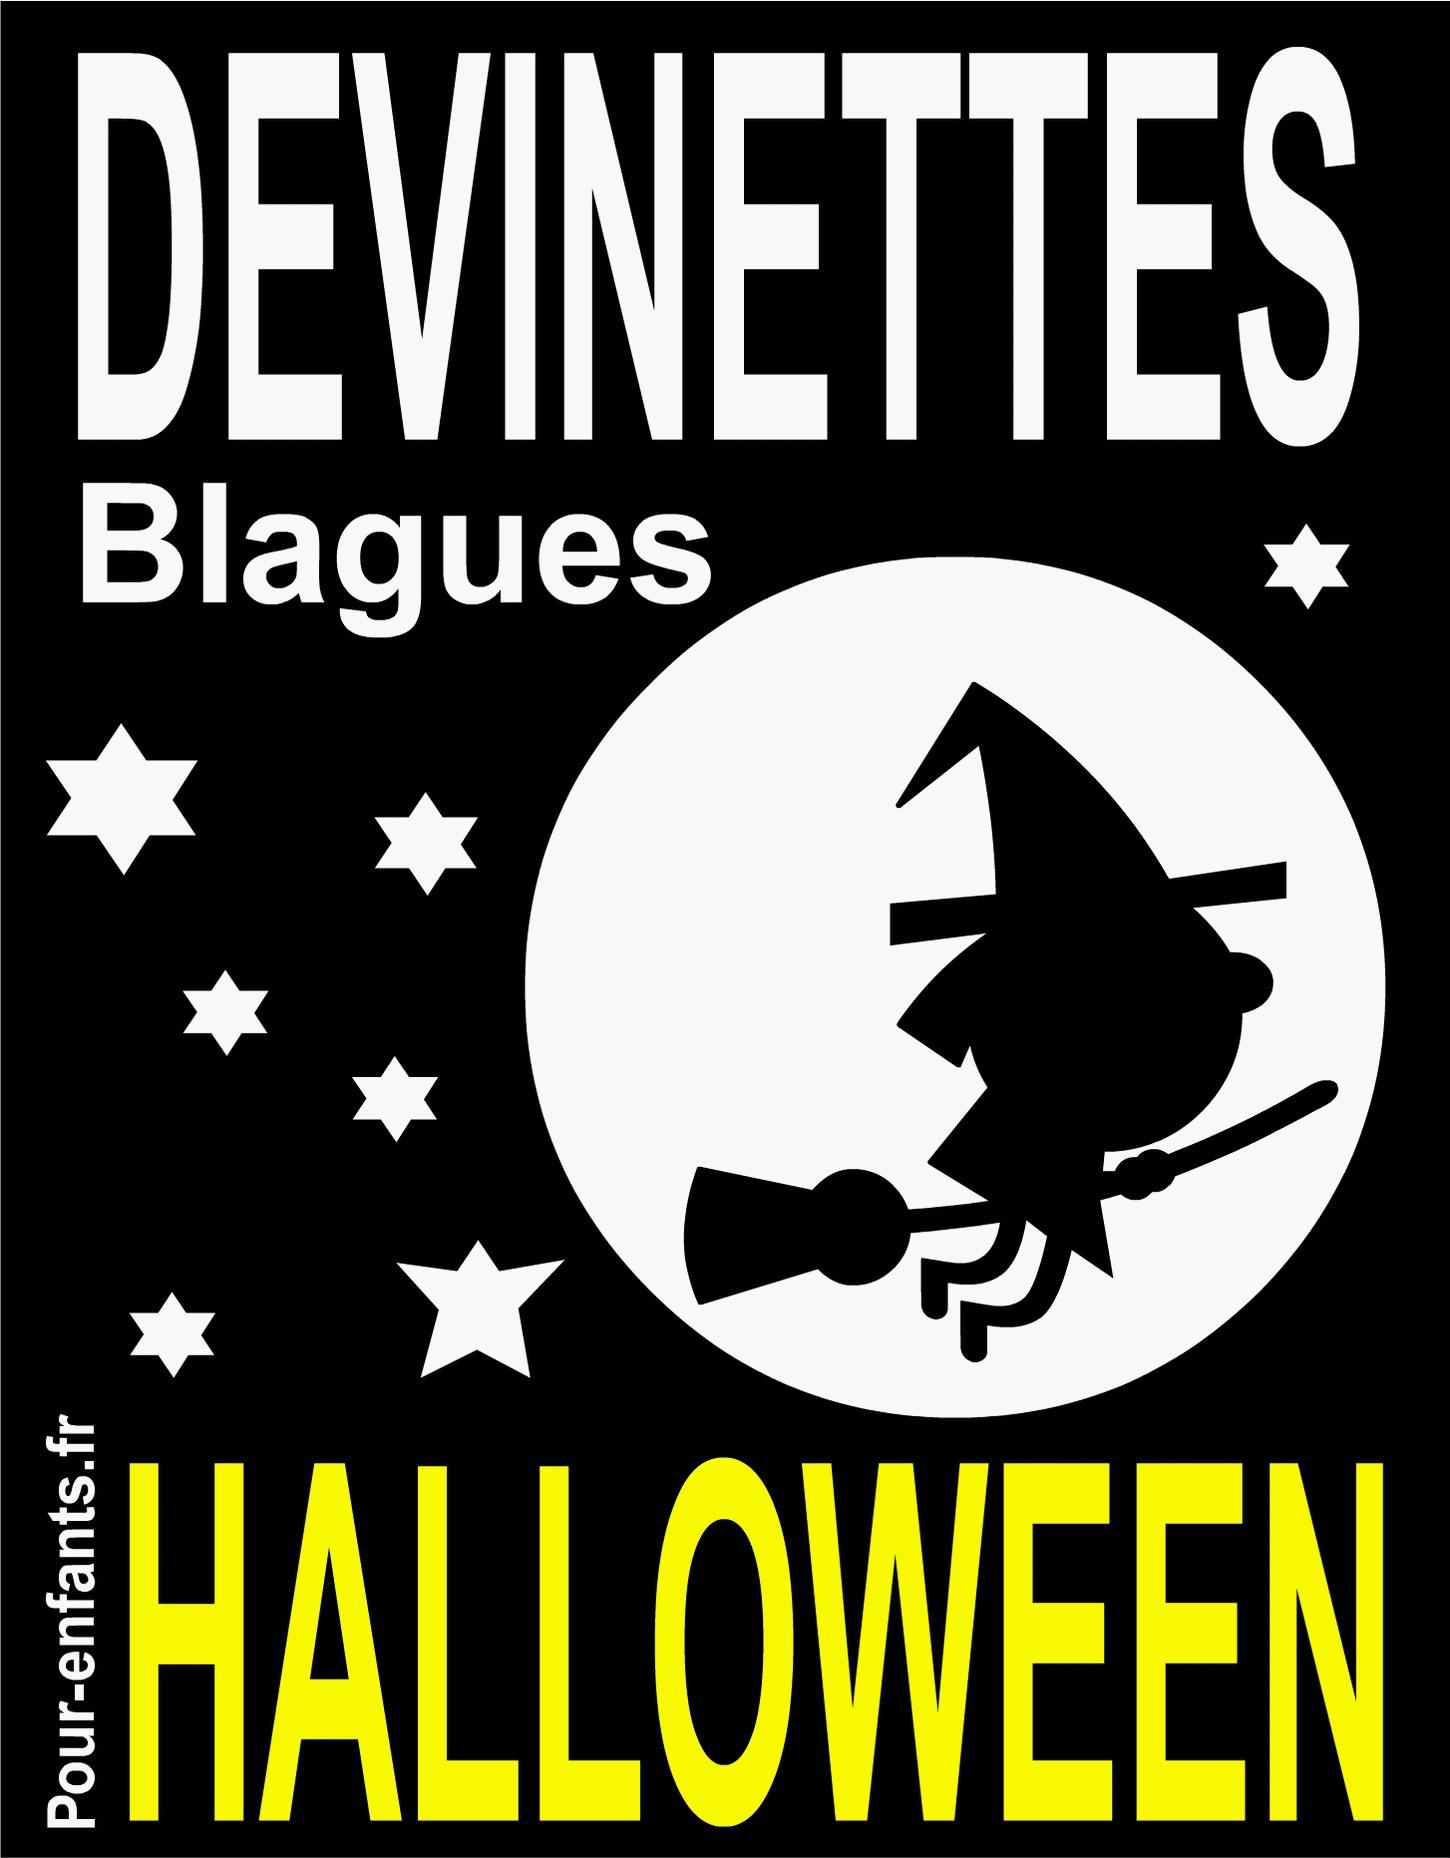 Devinettes, blagues ; Halloween